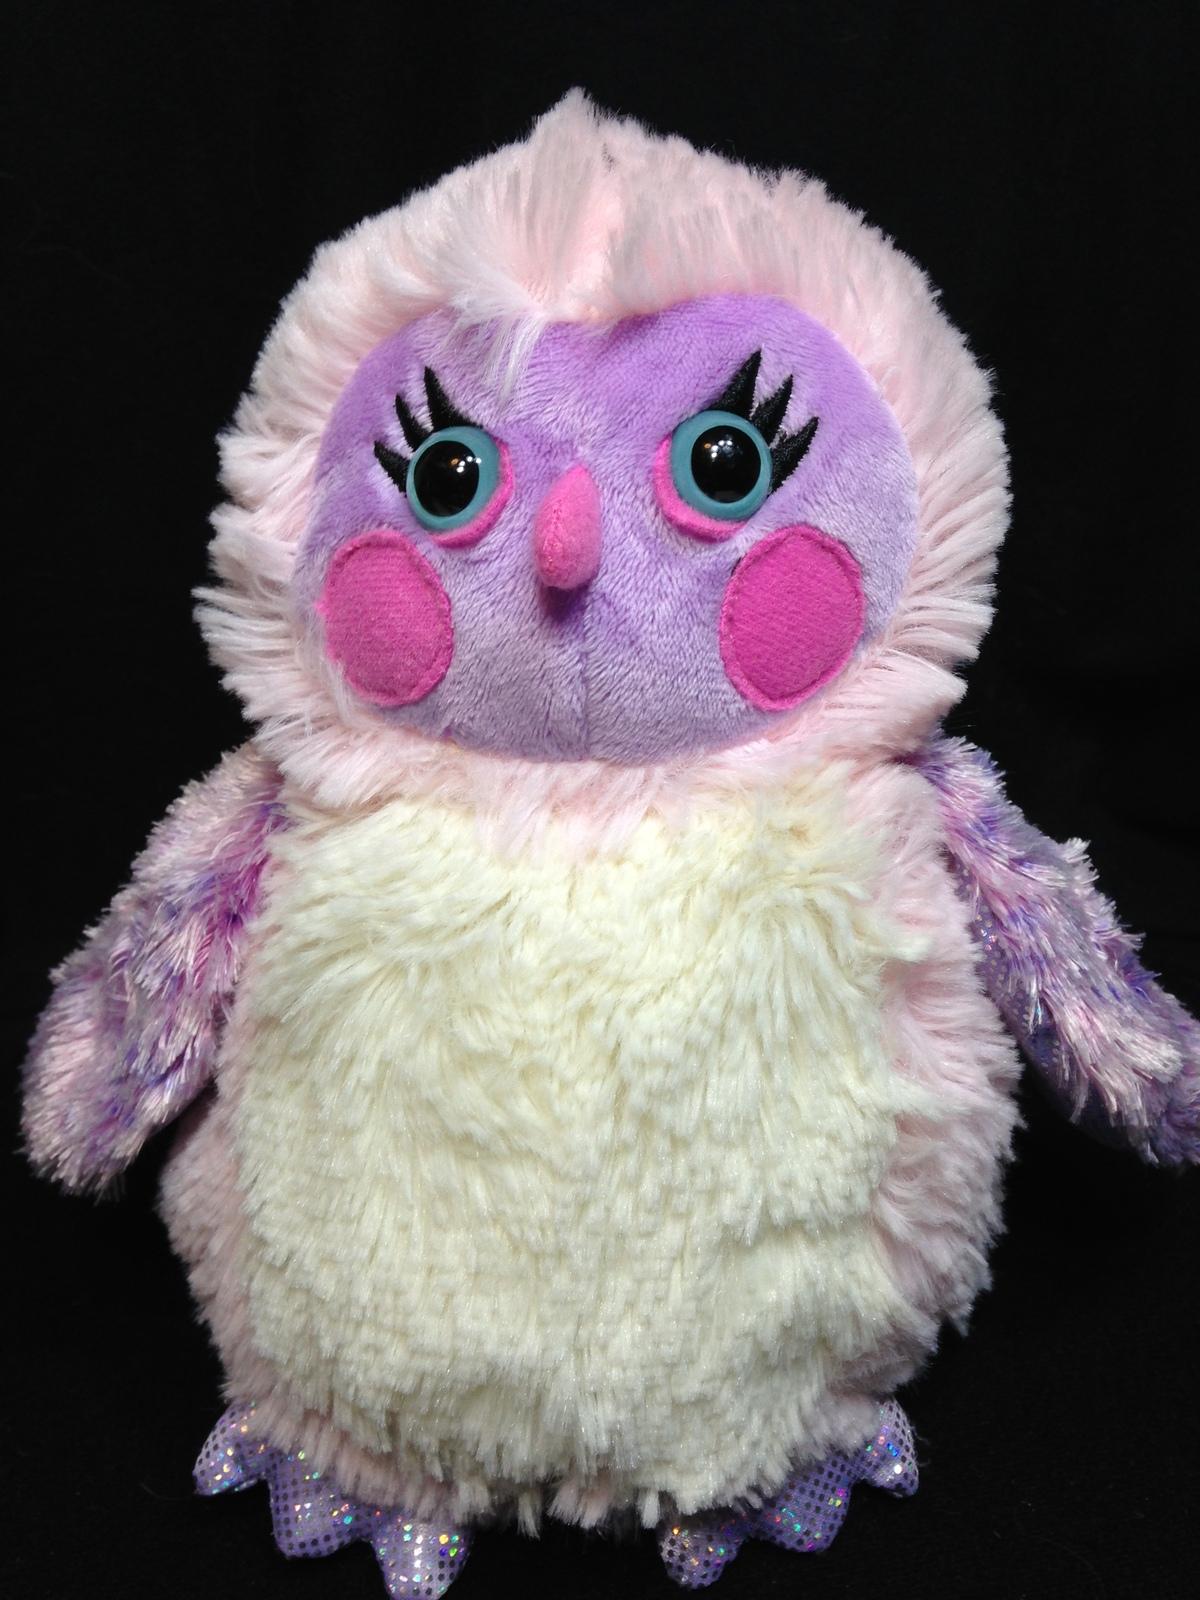 Ganz webkinz whooo la la owl pink plush iridescent soft toy hm752  no code 8   1